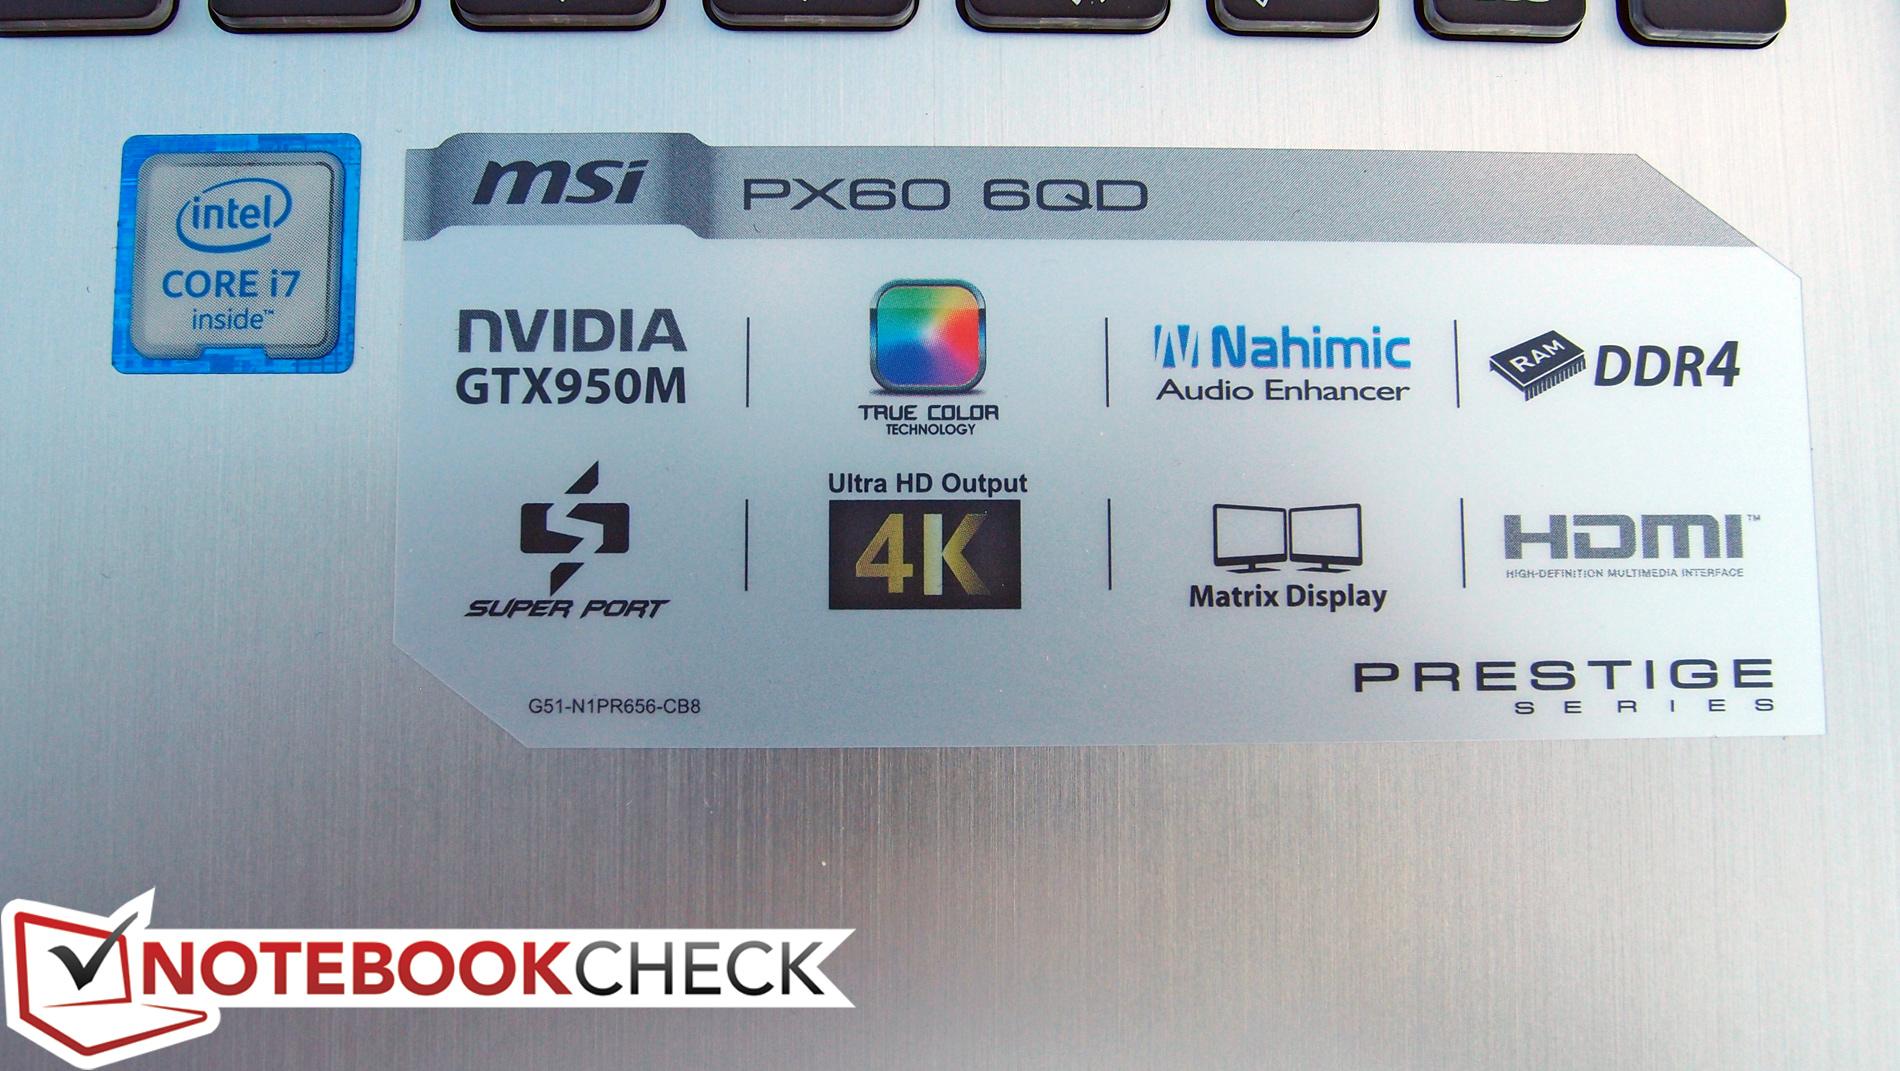 Driver for MSI PX60 6QD Realtek Card Reader